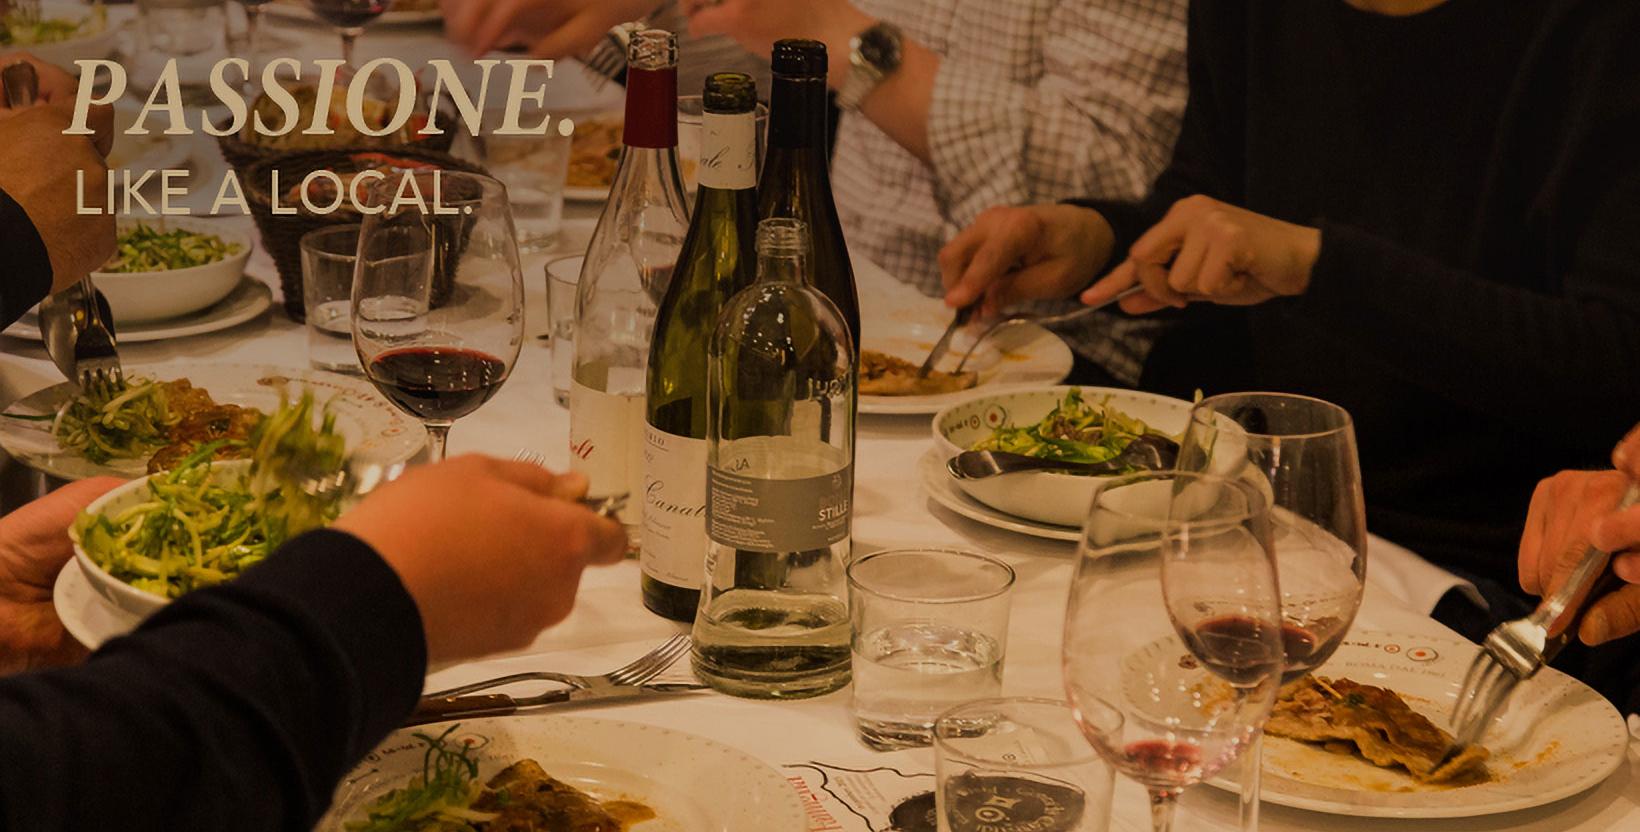 https://localike-roma.com/wp-content/uploads/2020/10/localike-roma-passione-ristorante-aspect-ratio-1640-832.jpg